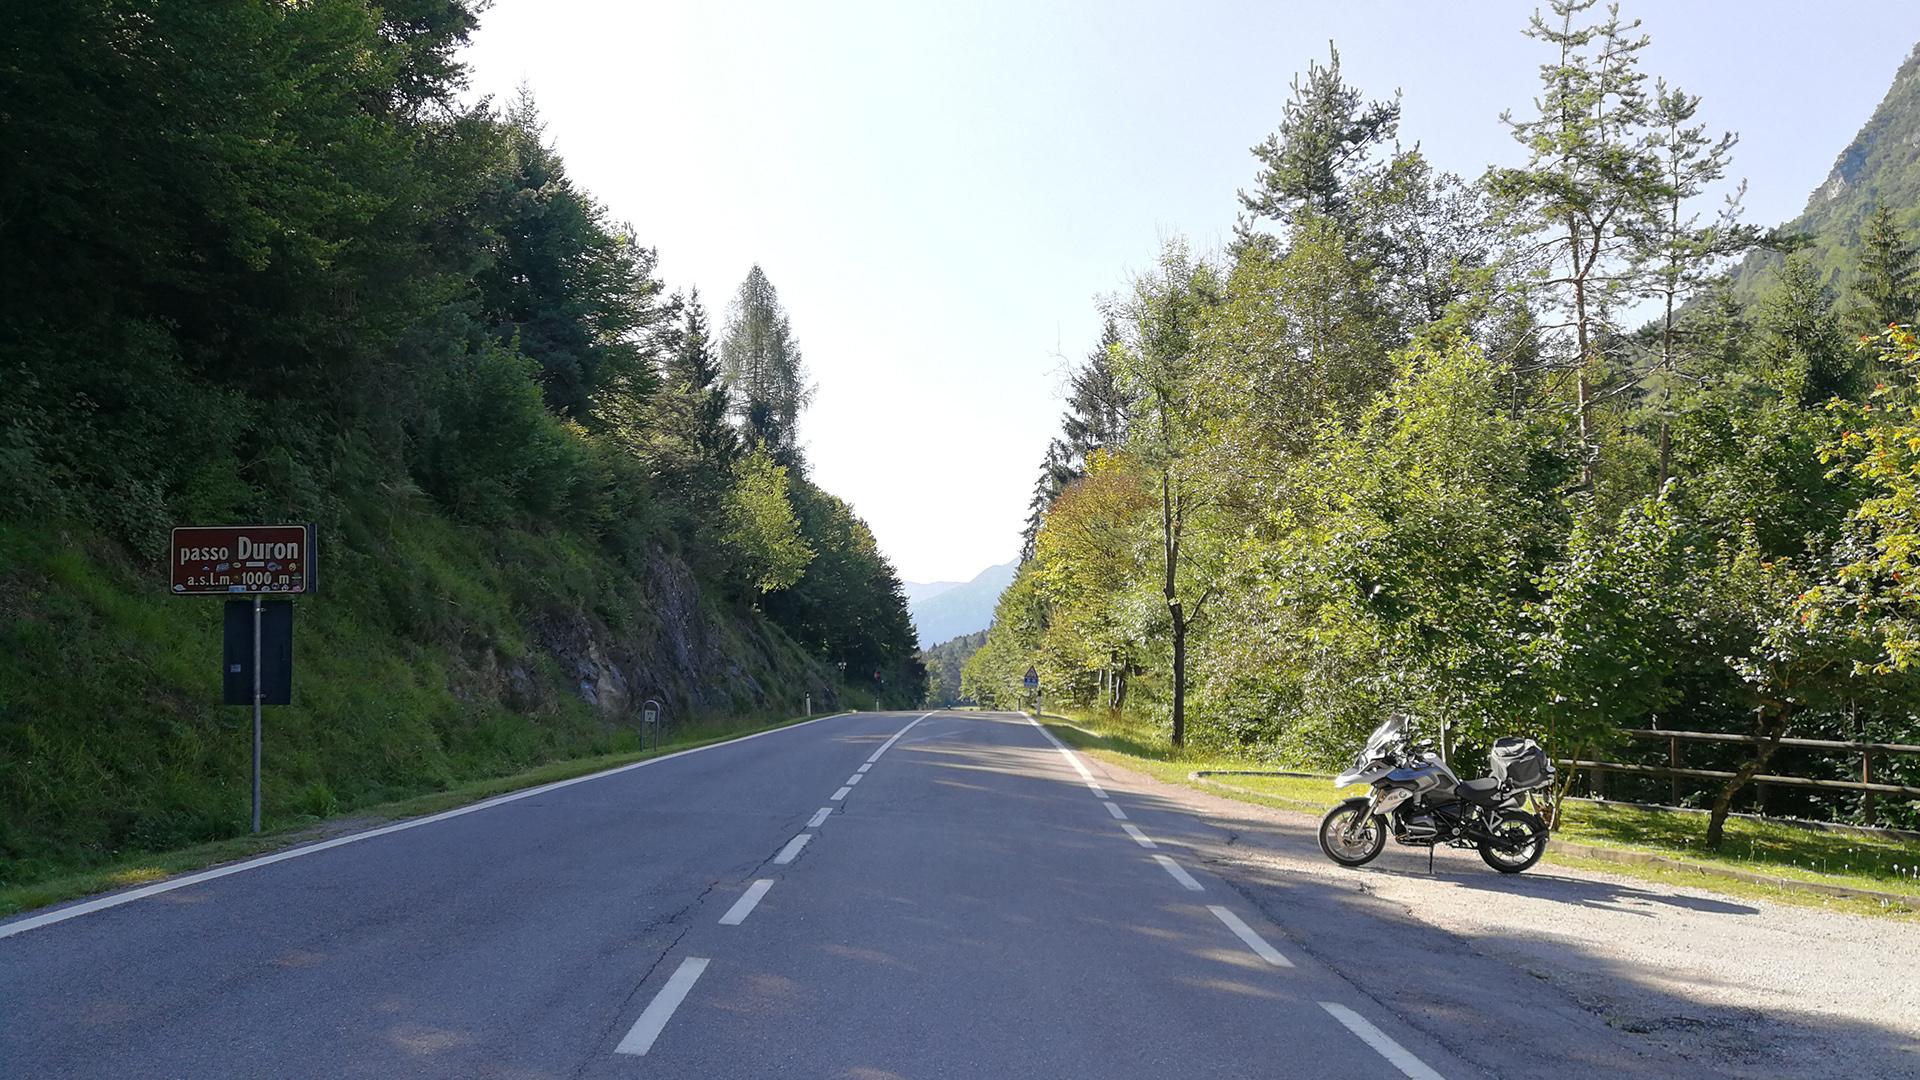 1000 - I - Passo Duron